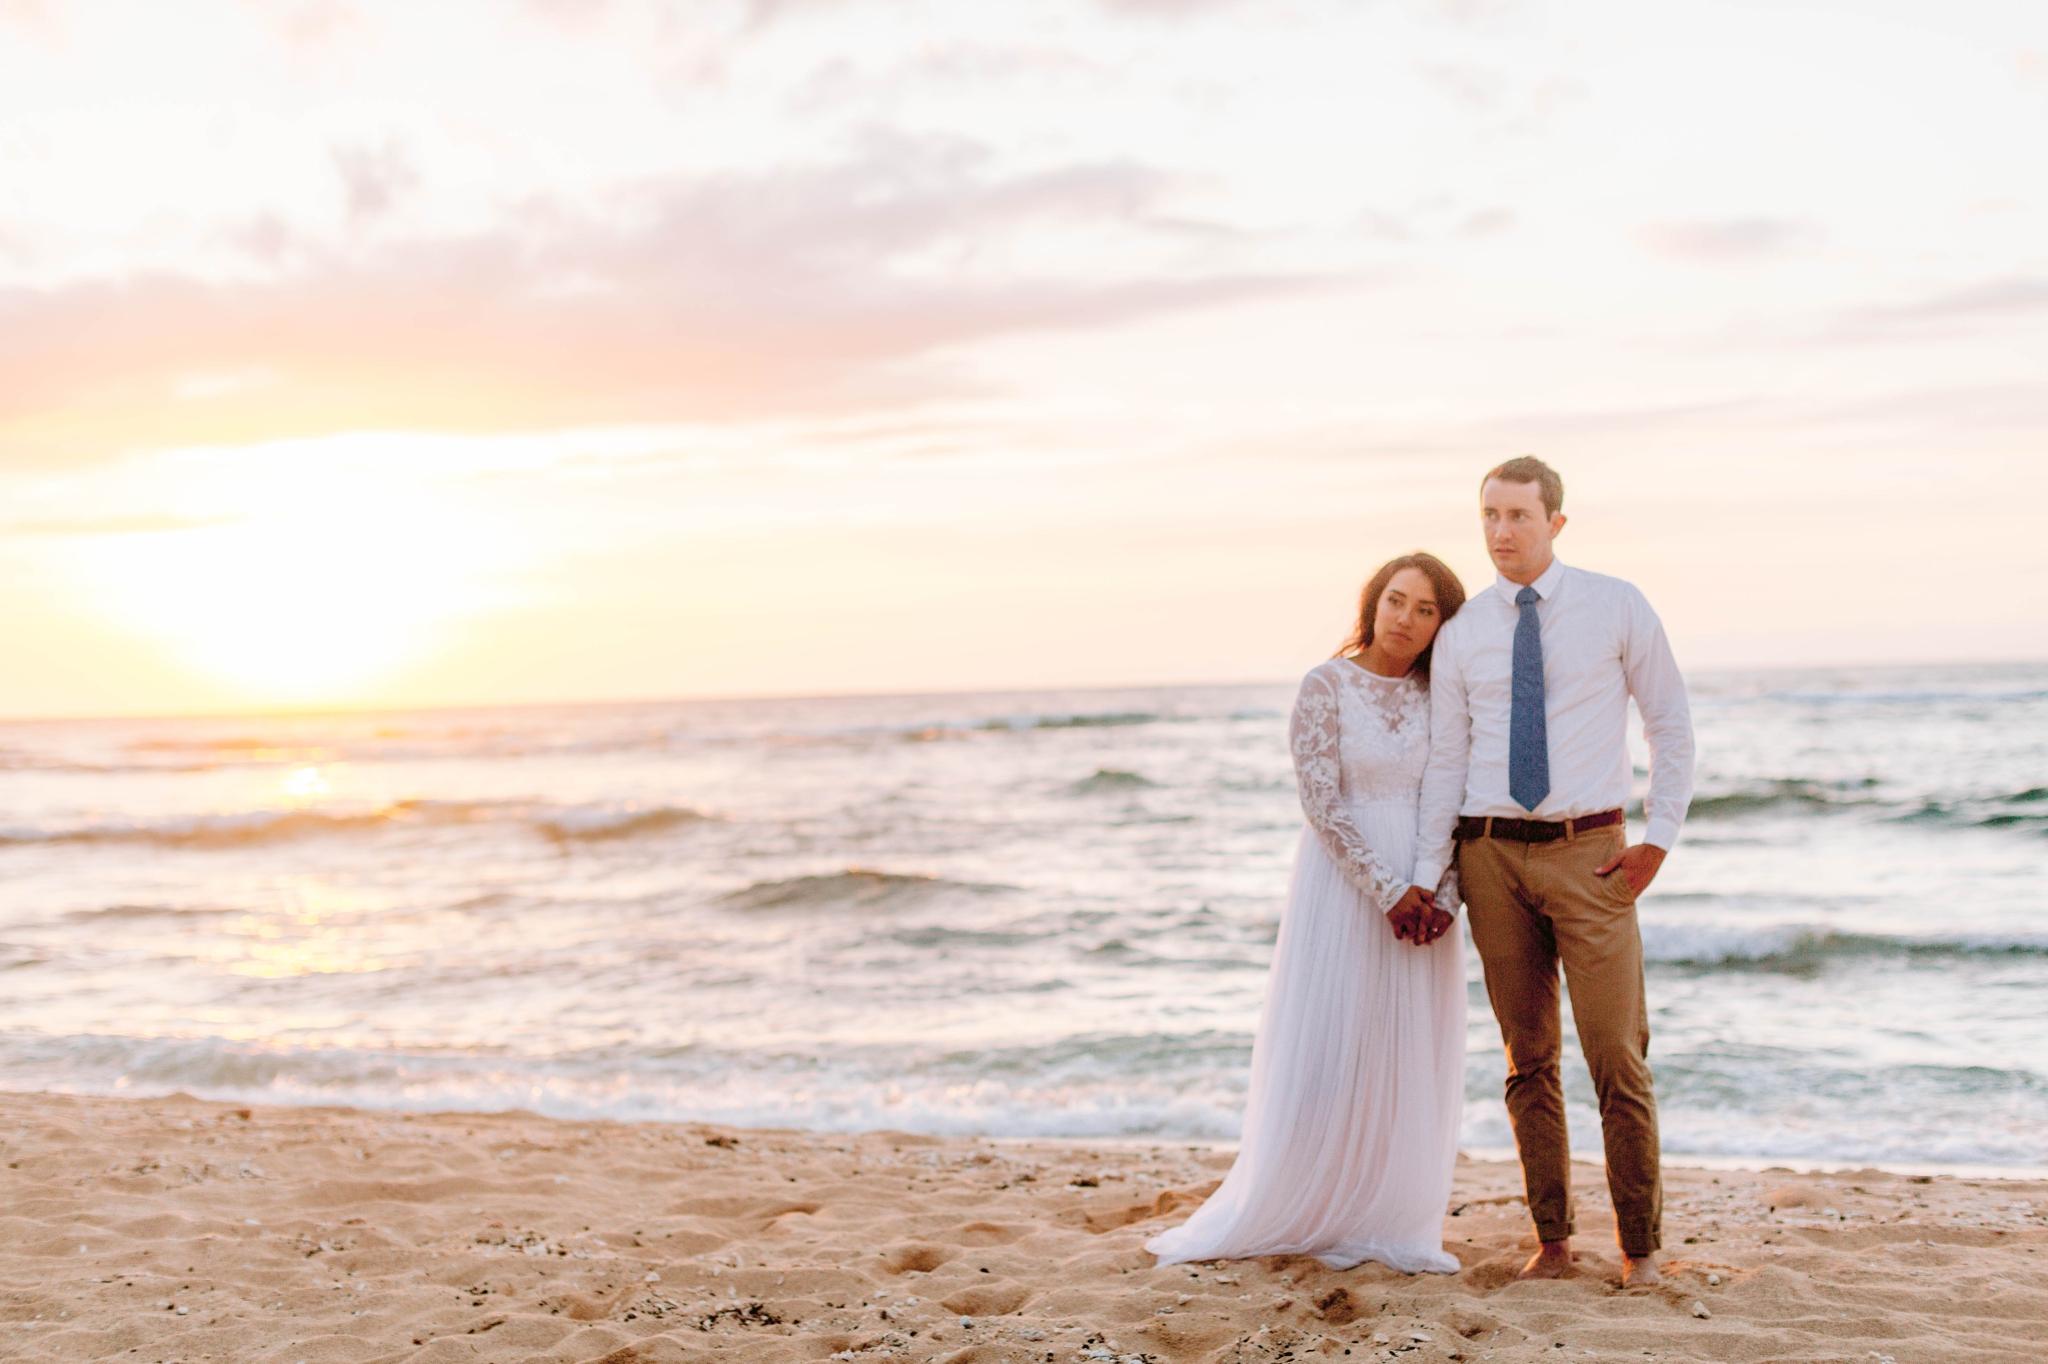 Beach Wedding Portraits at Sunset in Hawaii - Ana + Elijah - Wedding at Loulu Palm in Haleiwa, HI - Oahu Hawaii Wedding Photographer - #hawaiiweddingphotographer #oahuweddings #hawaiiweddings